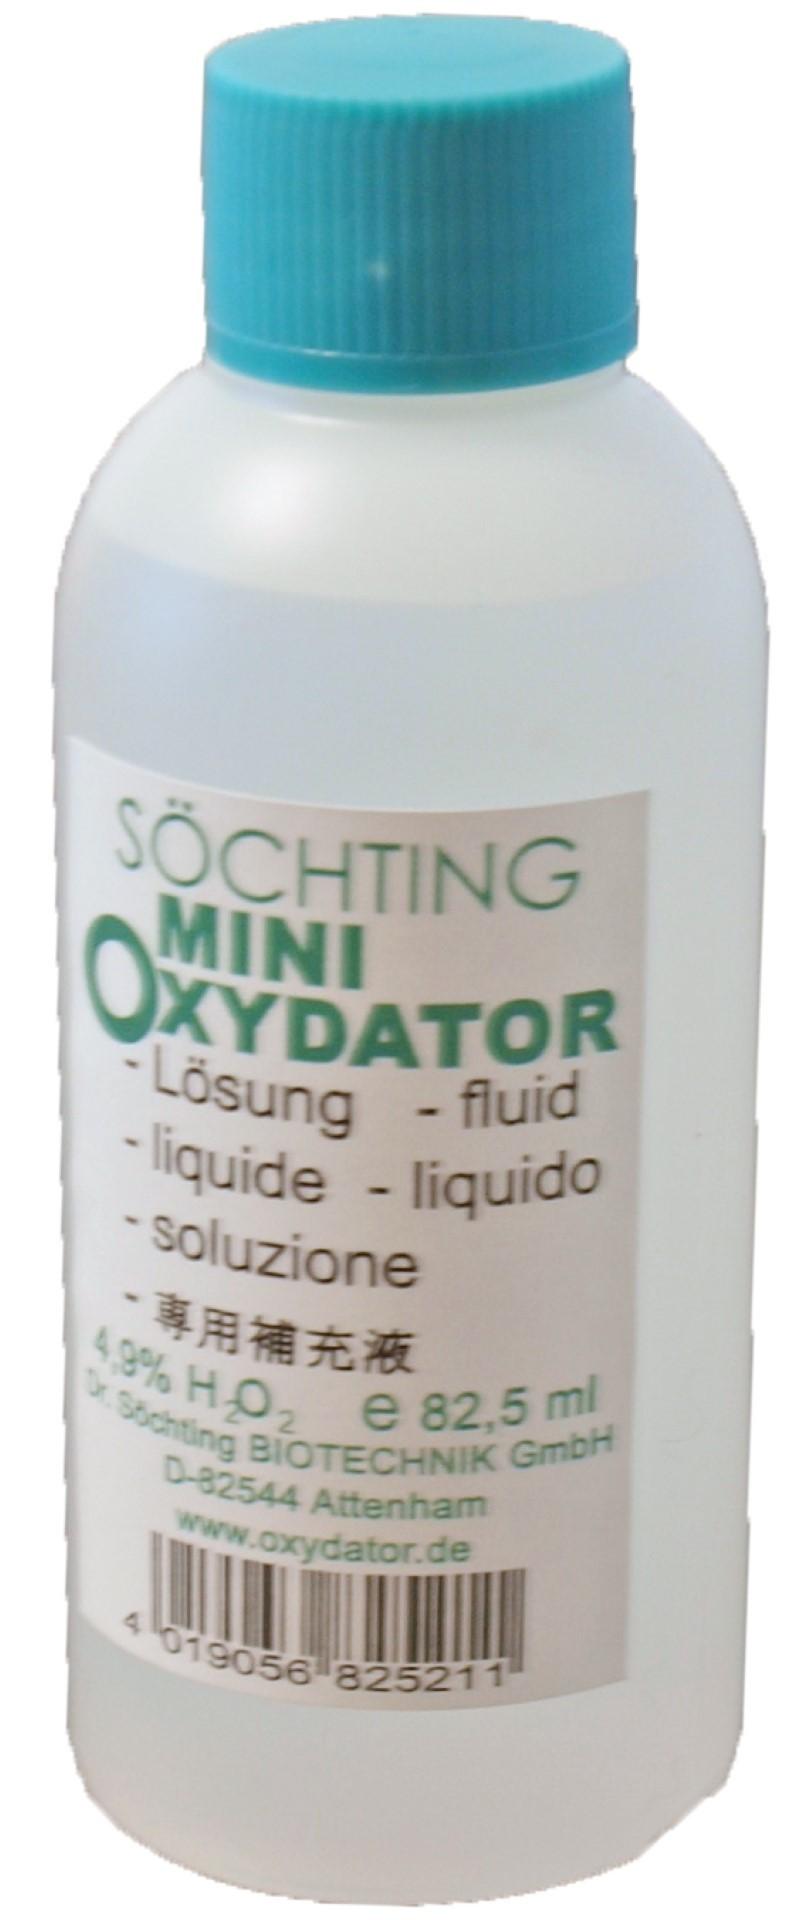 Sochting oxydator vloeistof mini 82.5 ml 4,9%